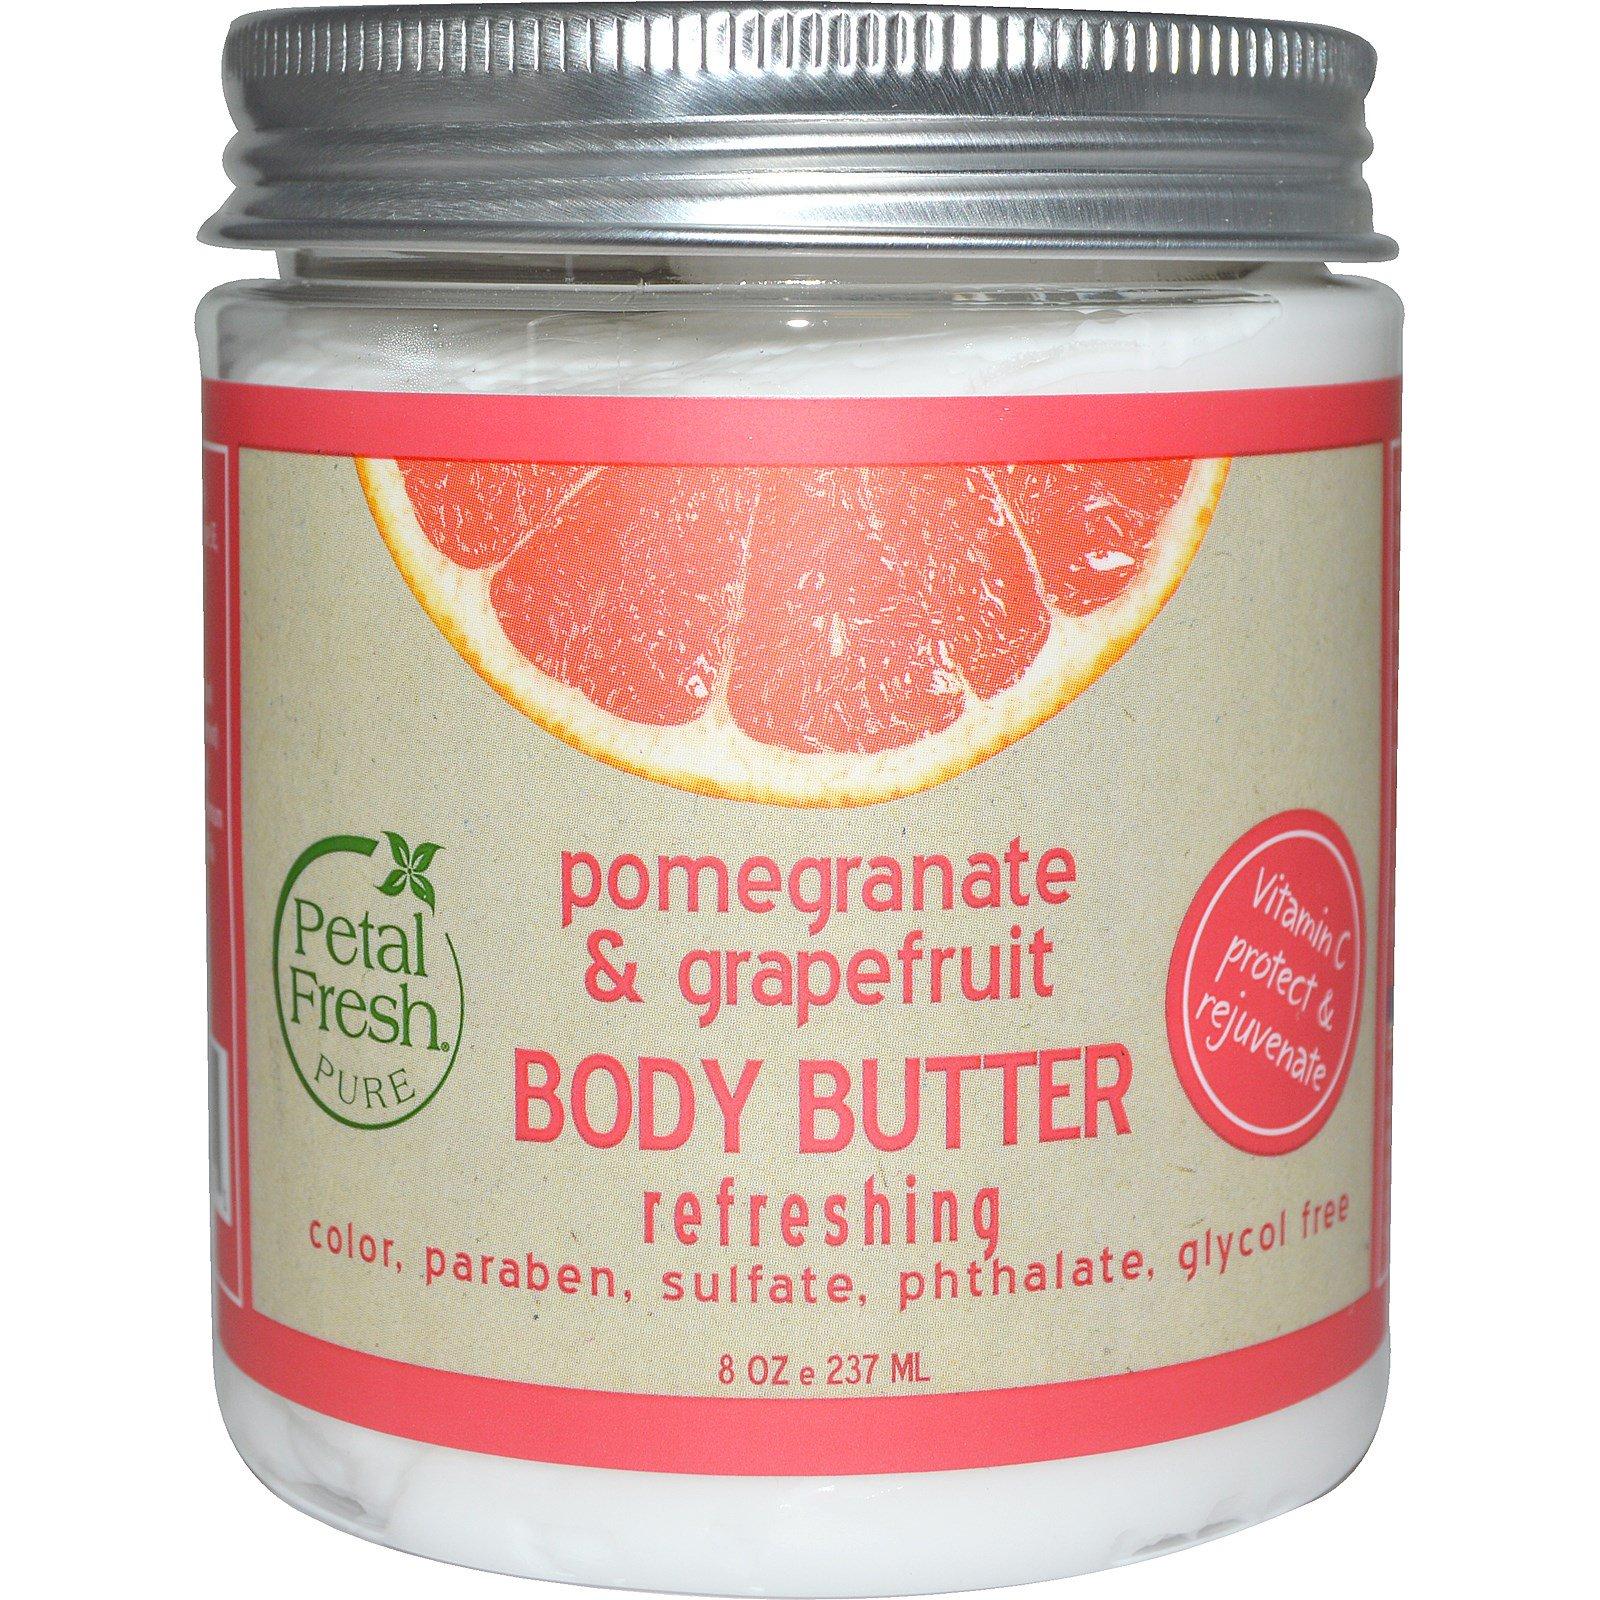 Petal Fresh, Pure, Body Butter, Refreshing, Pomegranate ...